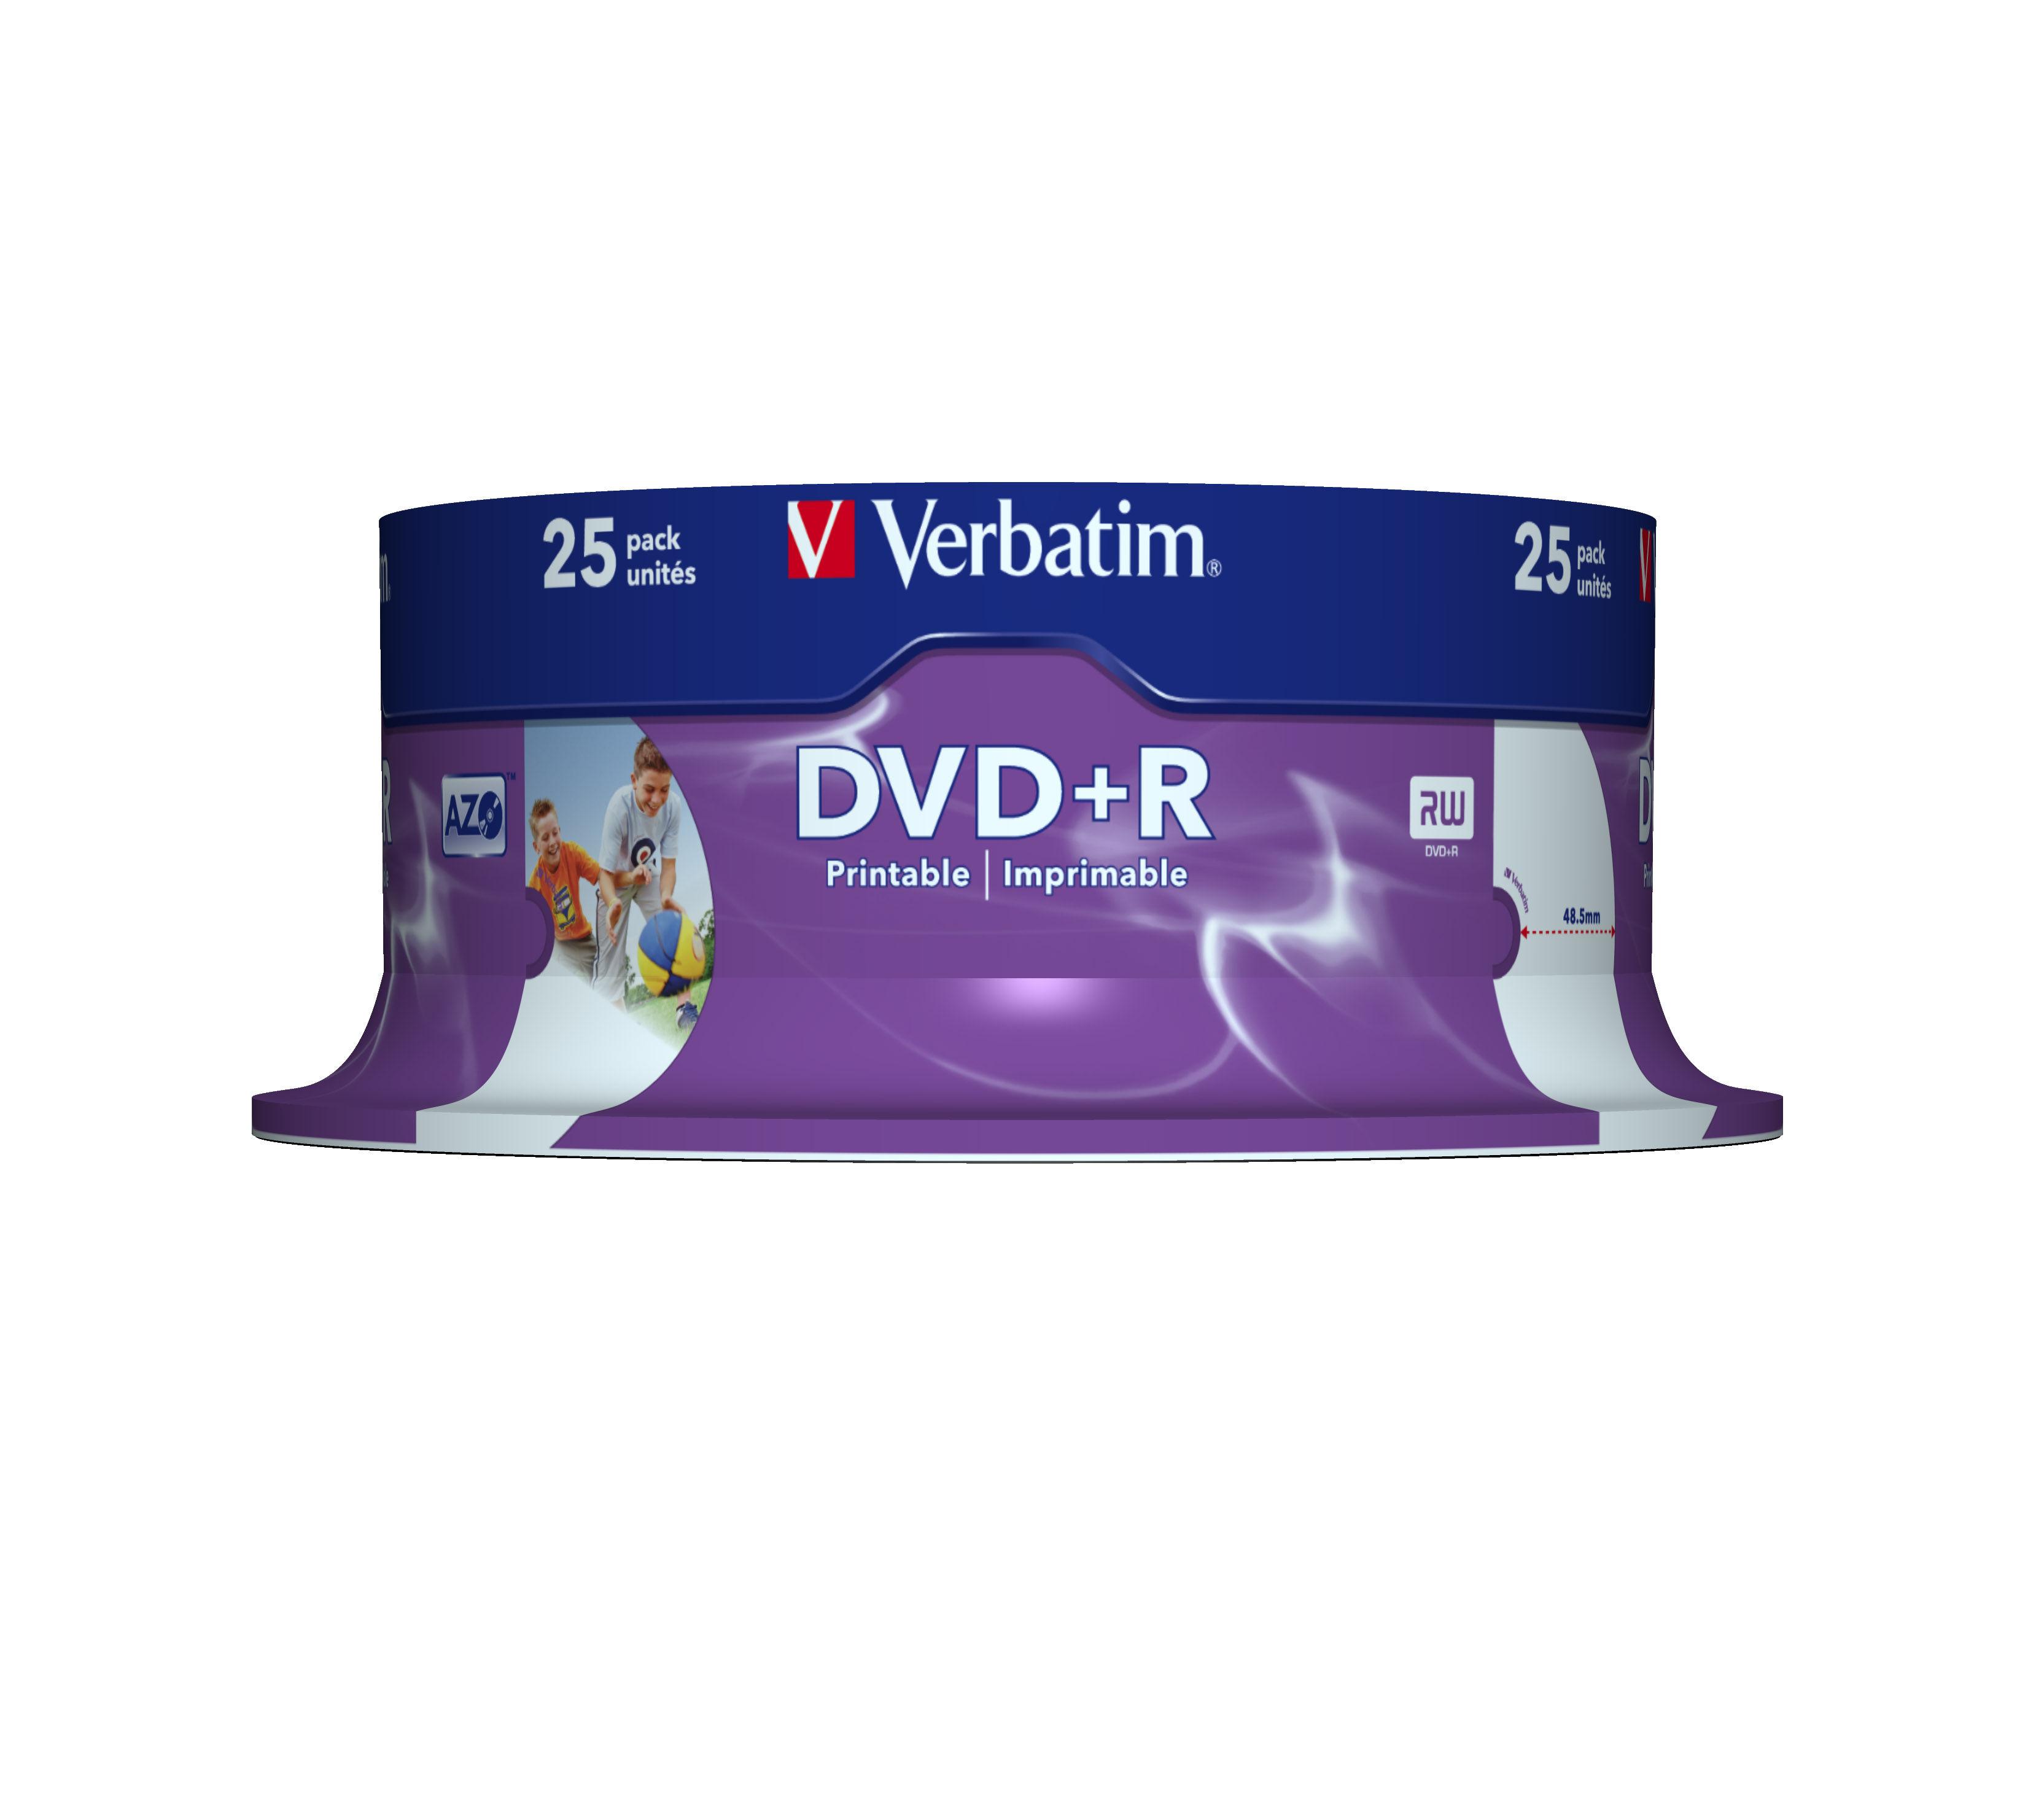 VERBATIM OPSLAGMEDIA CD-DVD-BLURAY VERB-43539